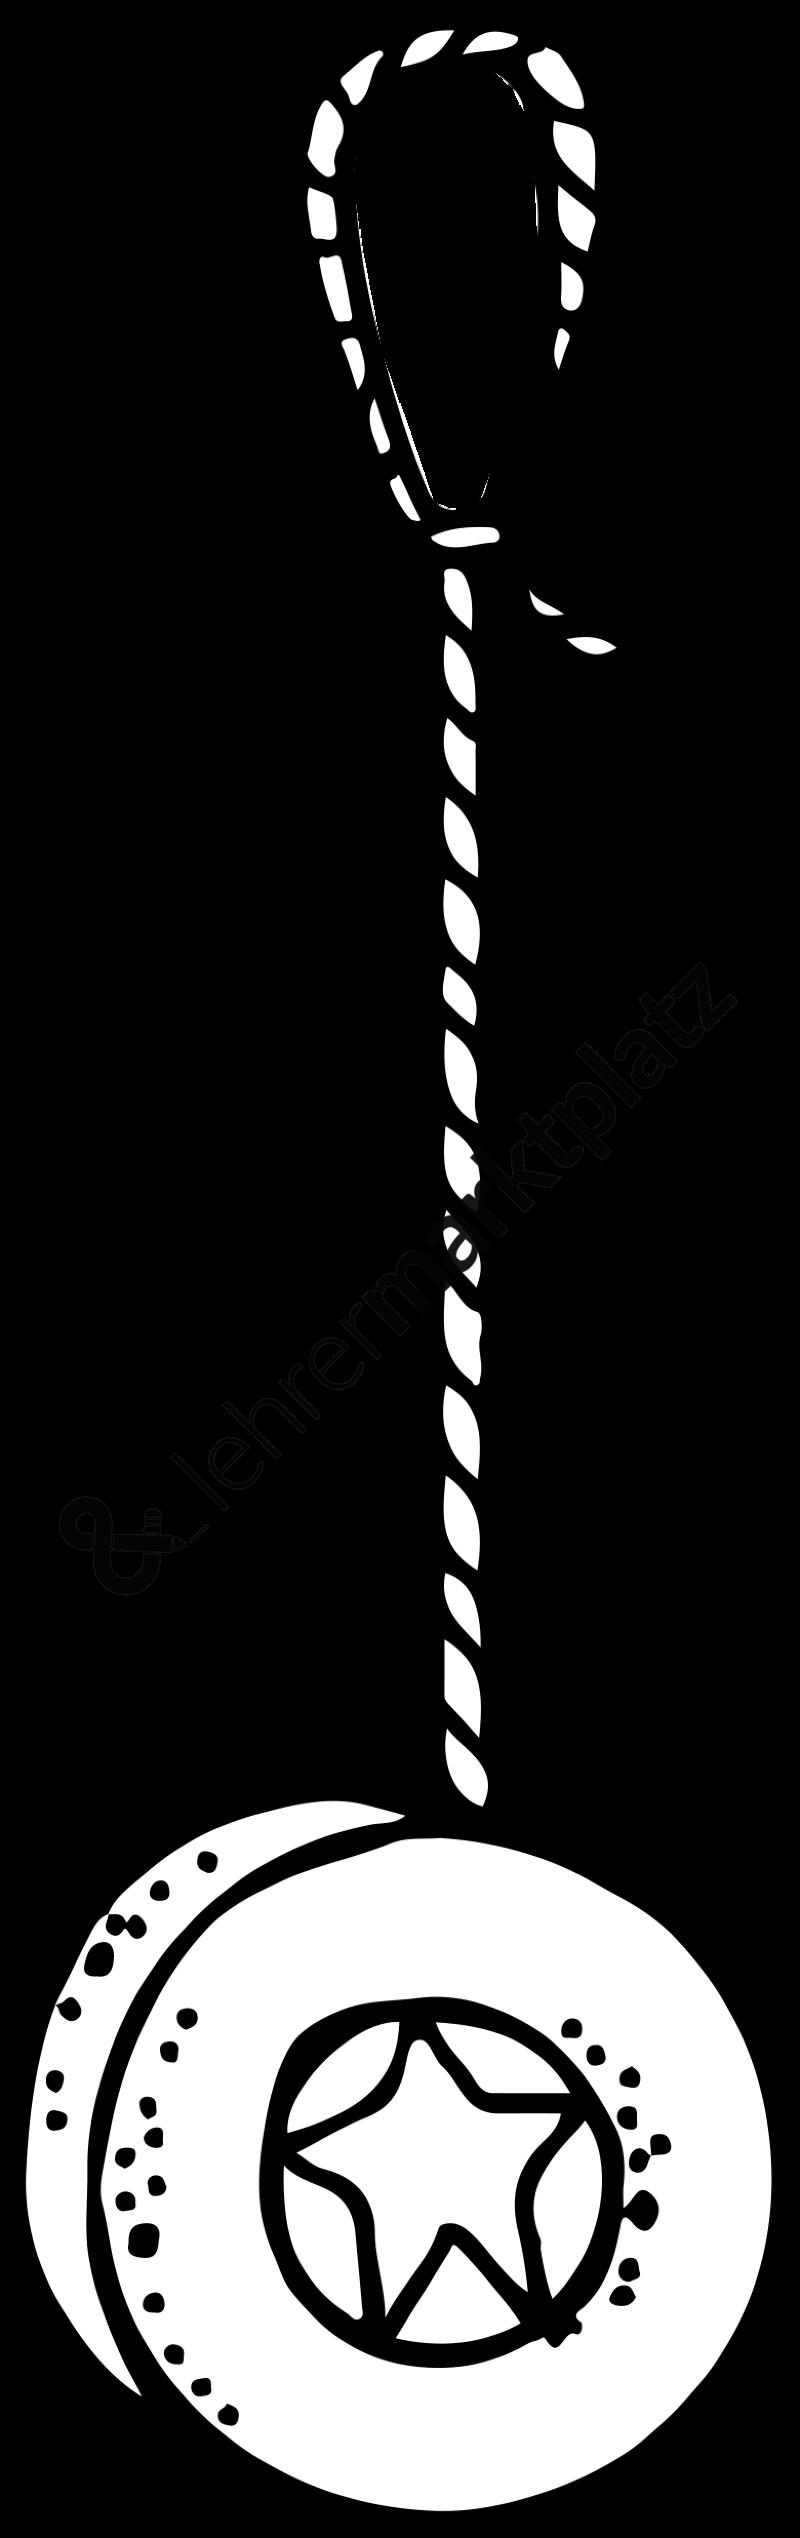 image transparent library Yoyo clipart black and white. Yo clip art mini